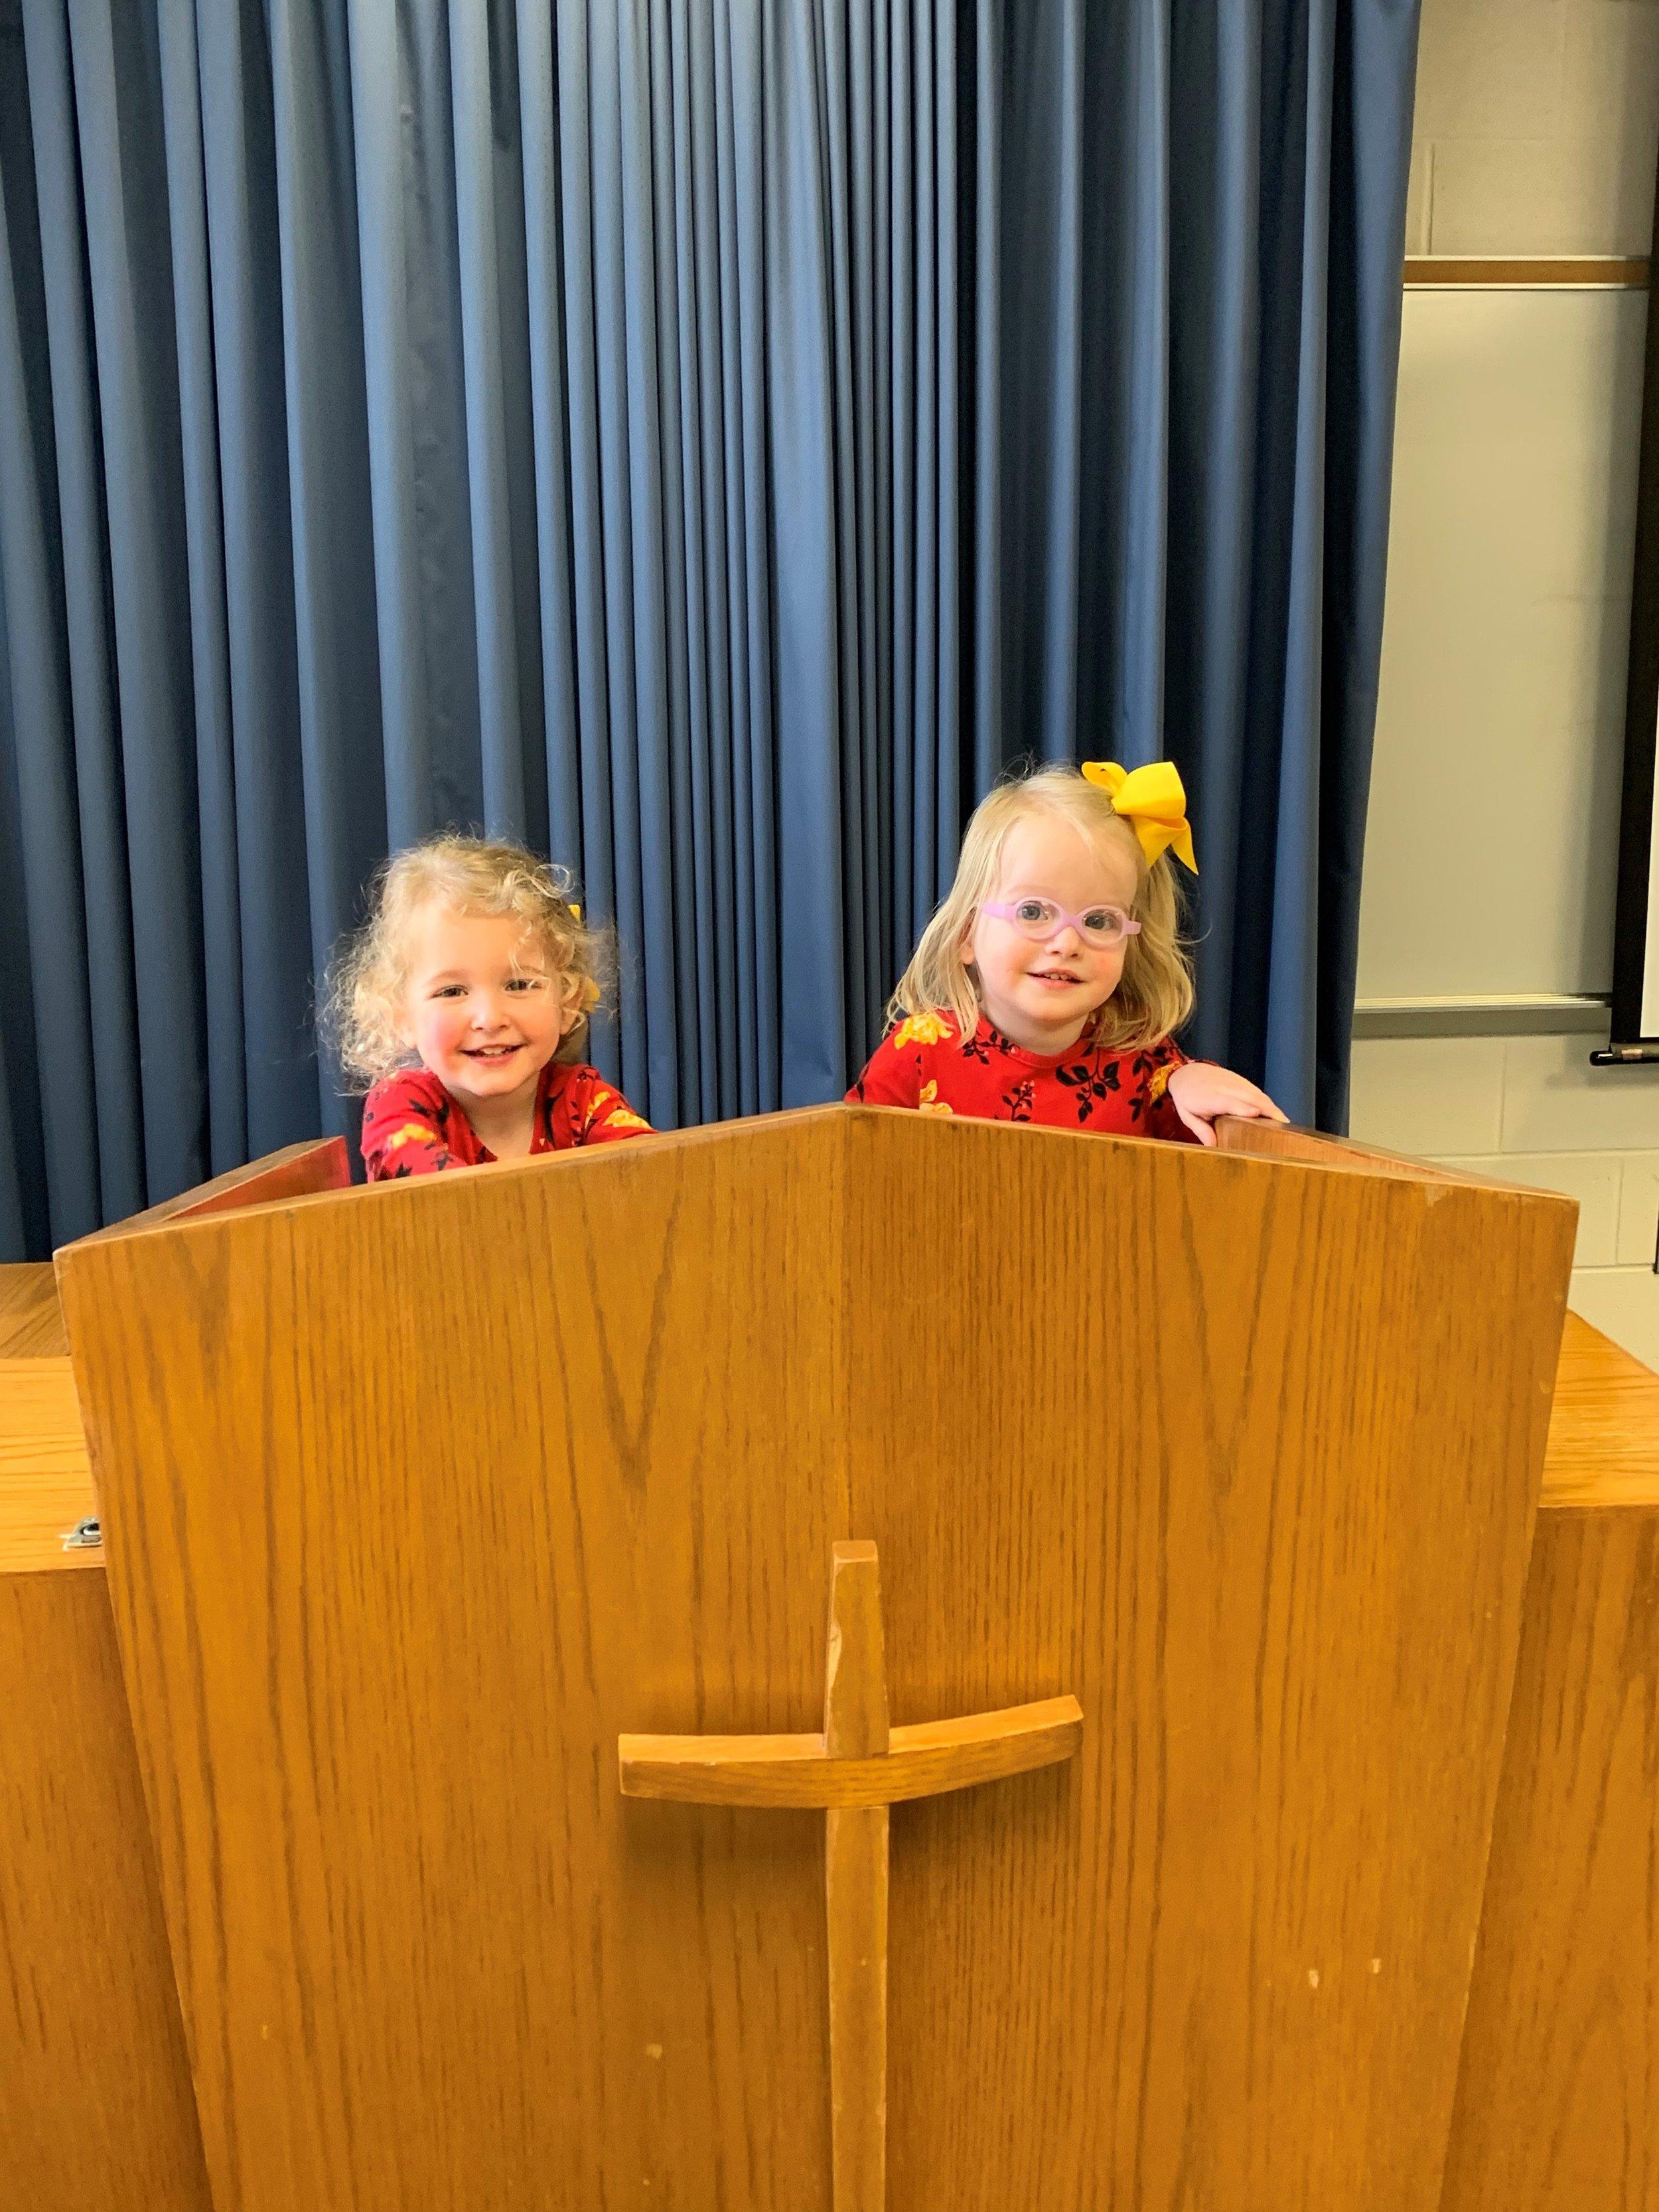 first-baptist-church-decatur-blog-living-with-faith-preaching-deal-twins.jpg